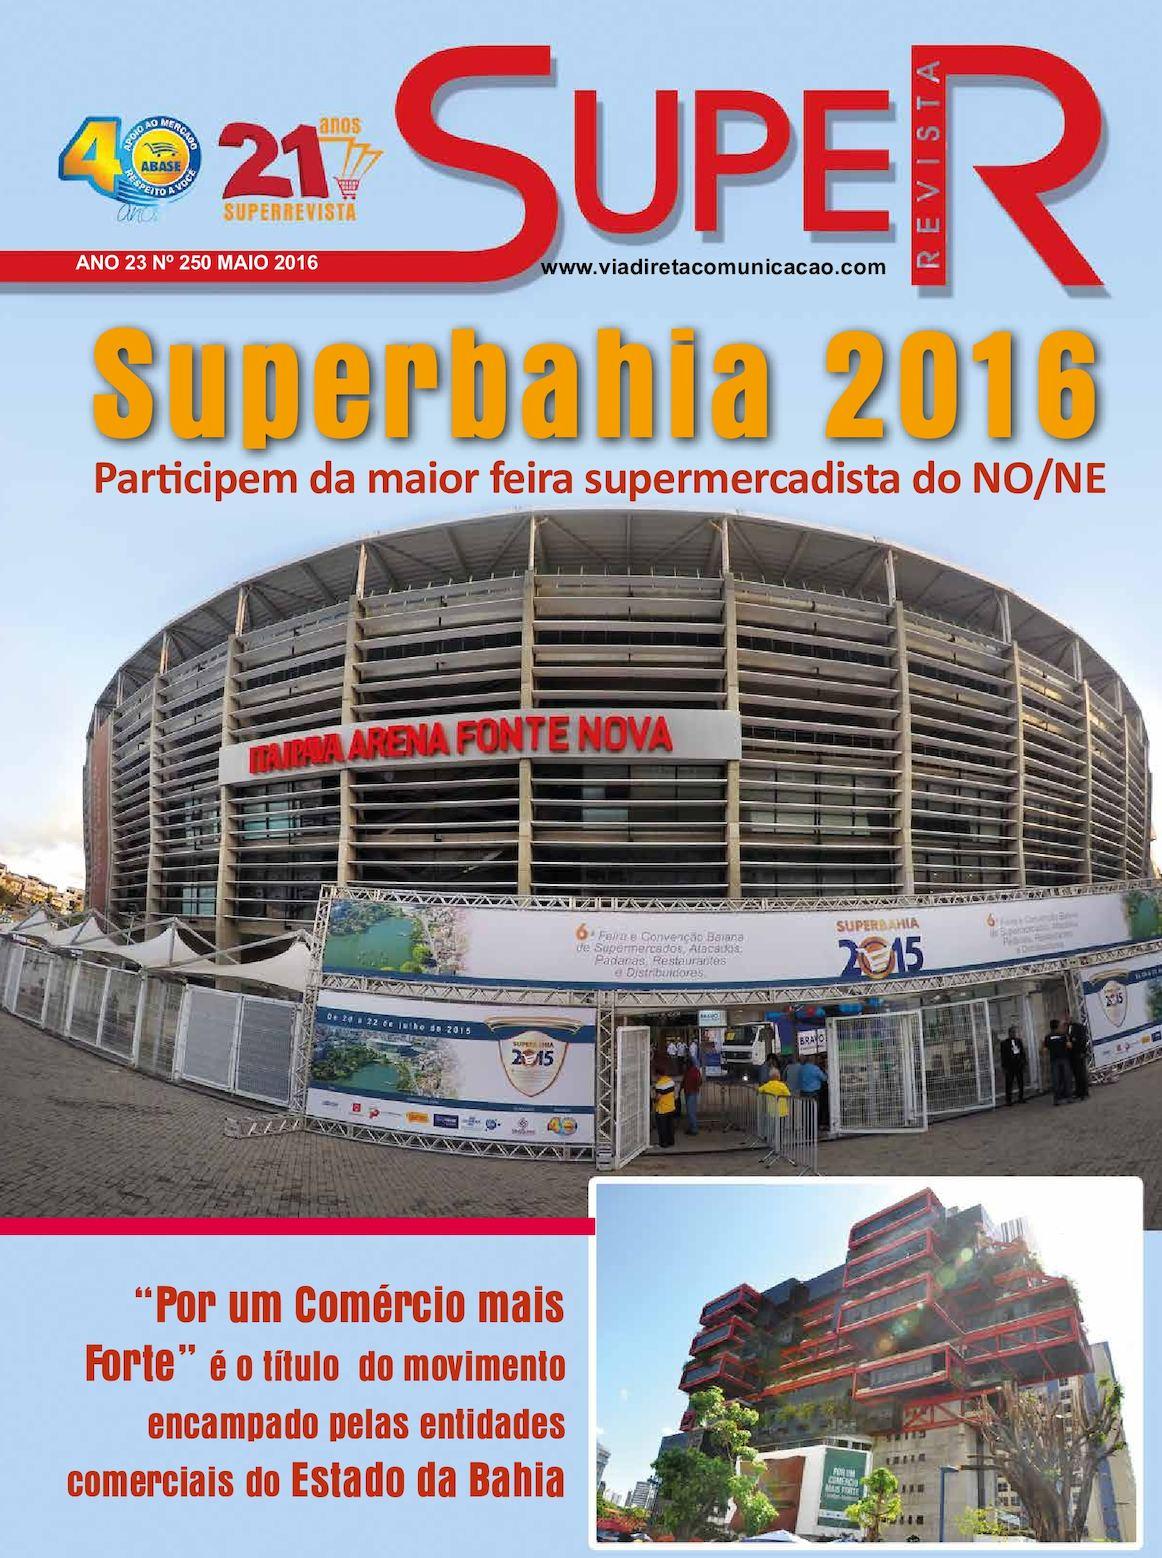 ad5b931dd1f3 Abase - Super Revista - Maio 2016 - CALAMEO Downloader